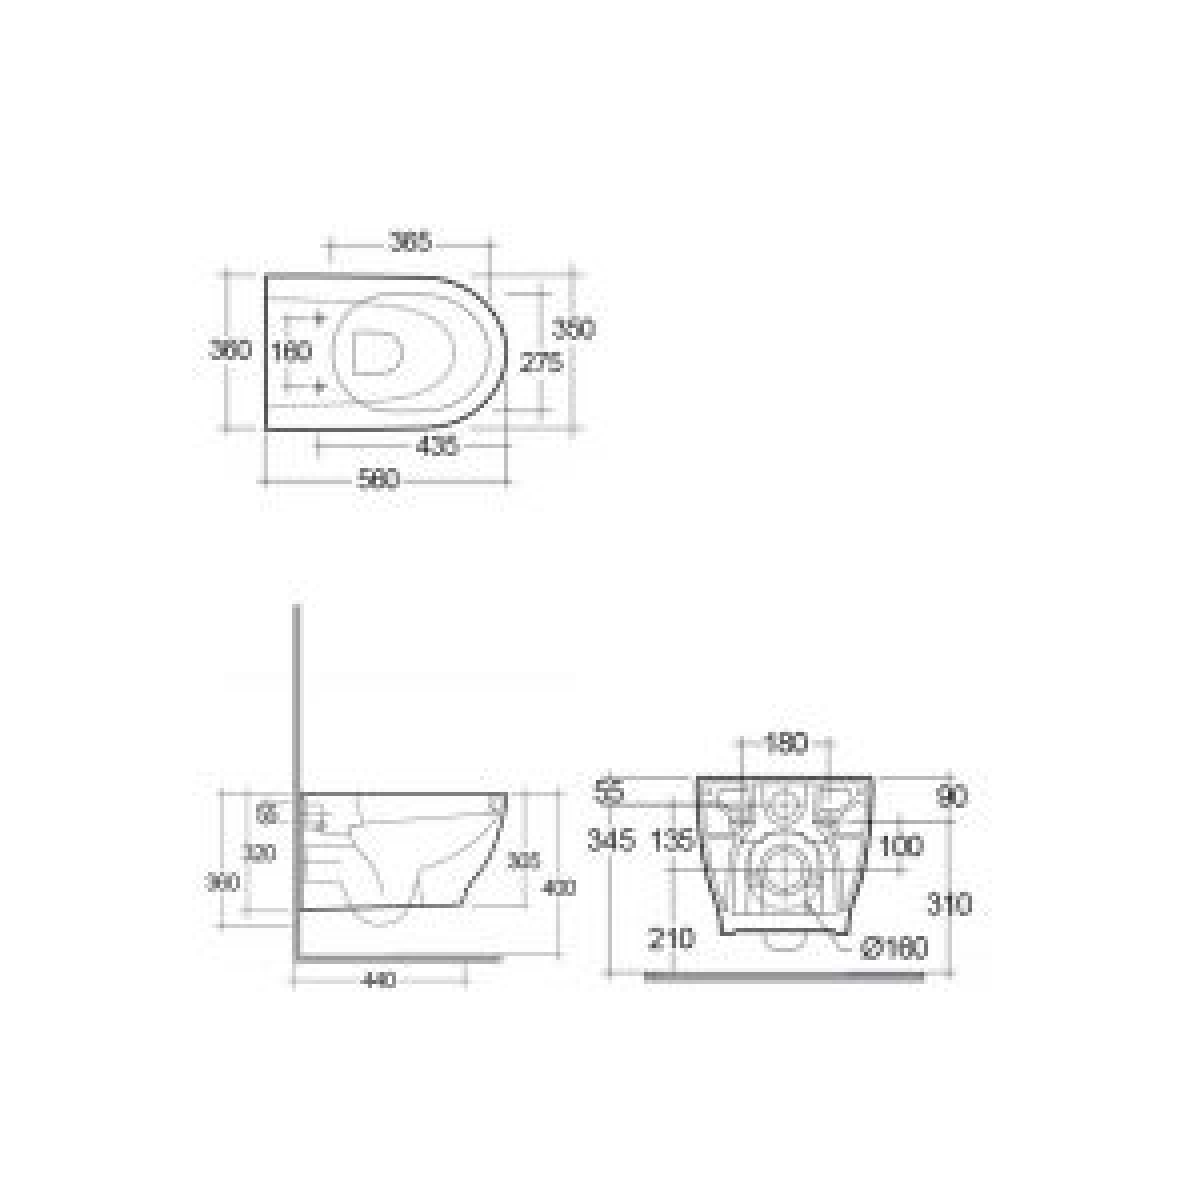 RAK Moon Wall Hung Hidden Fixation WC Pan with Soft Close Seat Measurements